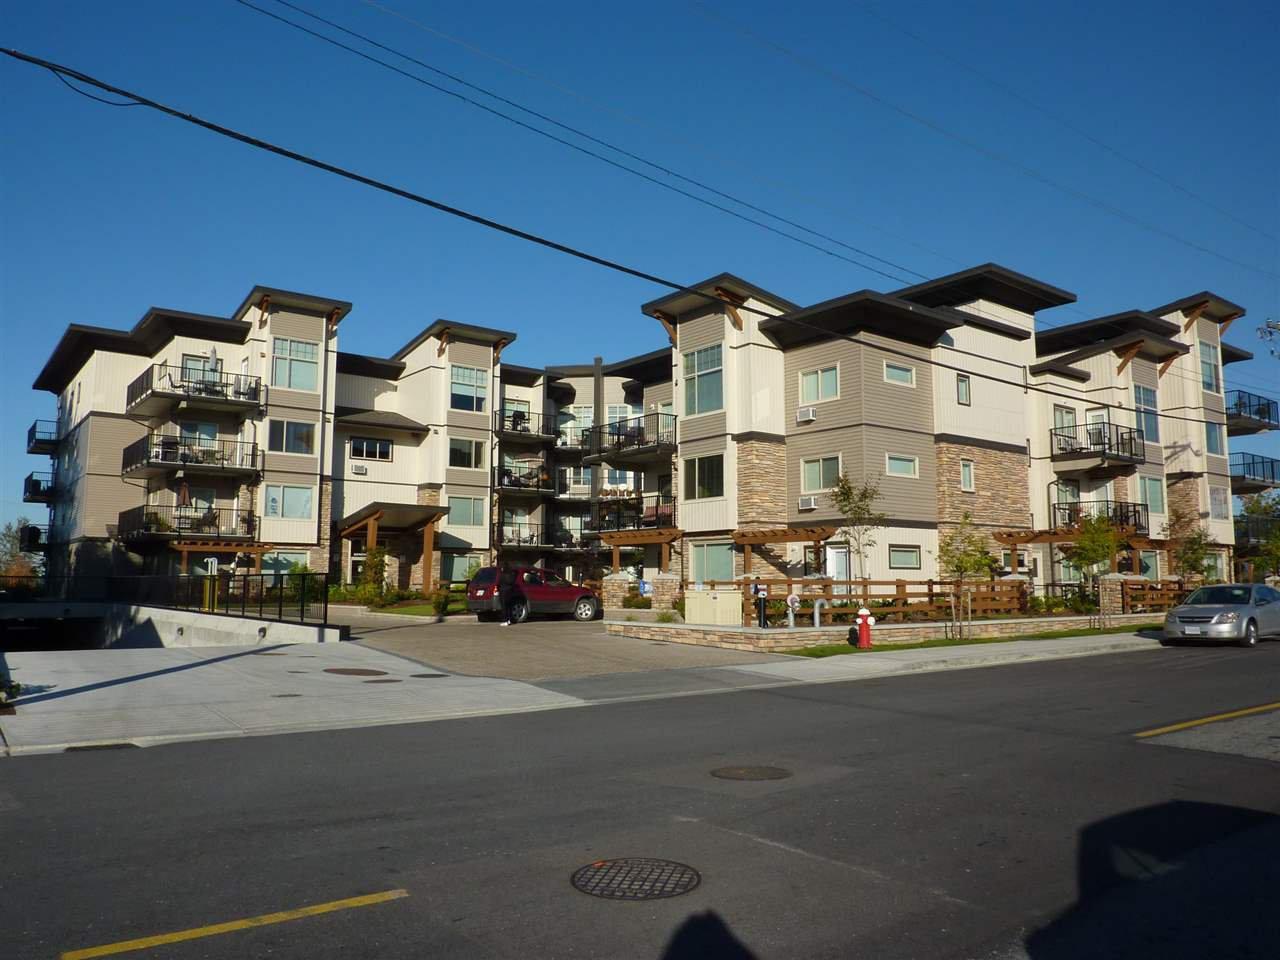 "Main Photo: 208 11935 BURNETT Street in Maple Ridge: East Central Condo for sale in ""KENSIGNTON PLACE"" : MLS®# R2275775"